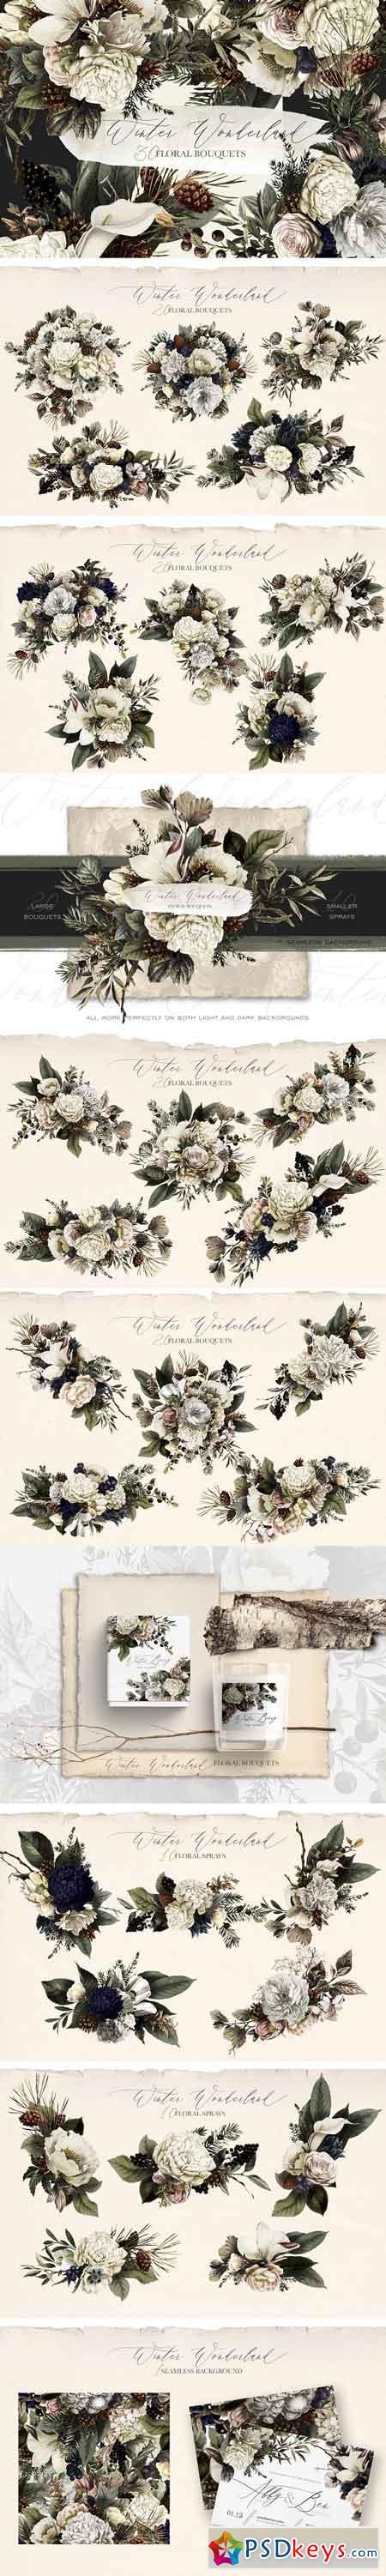 Winter Wonderland Floral Bouquets 2848096